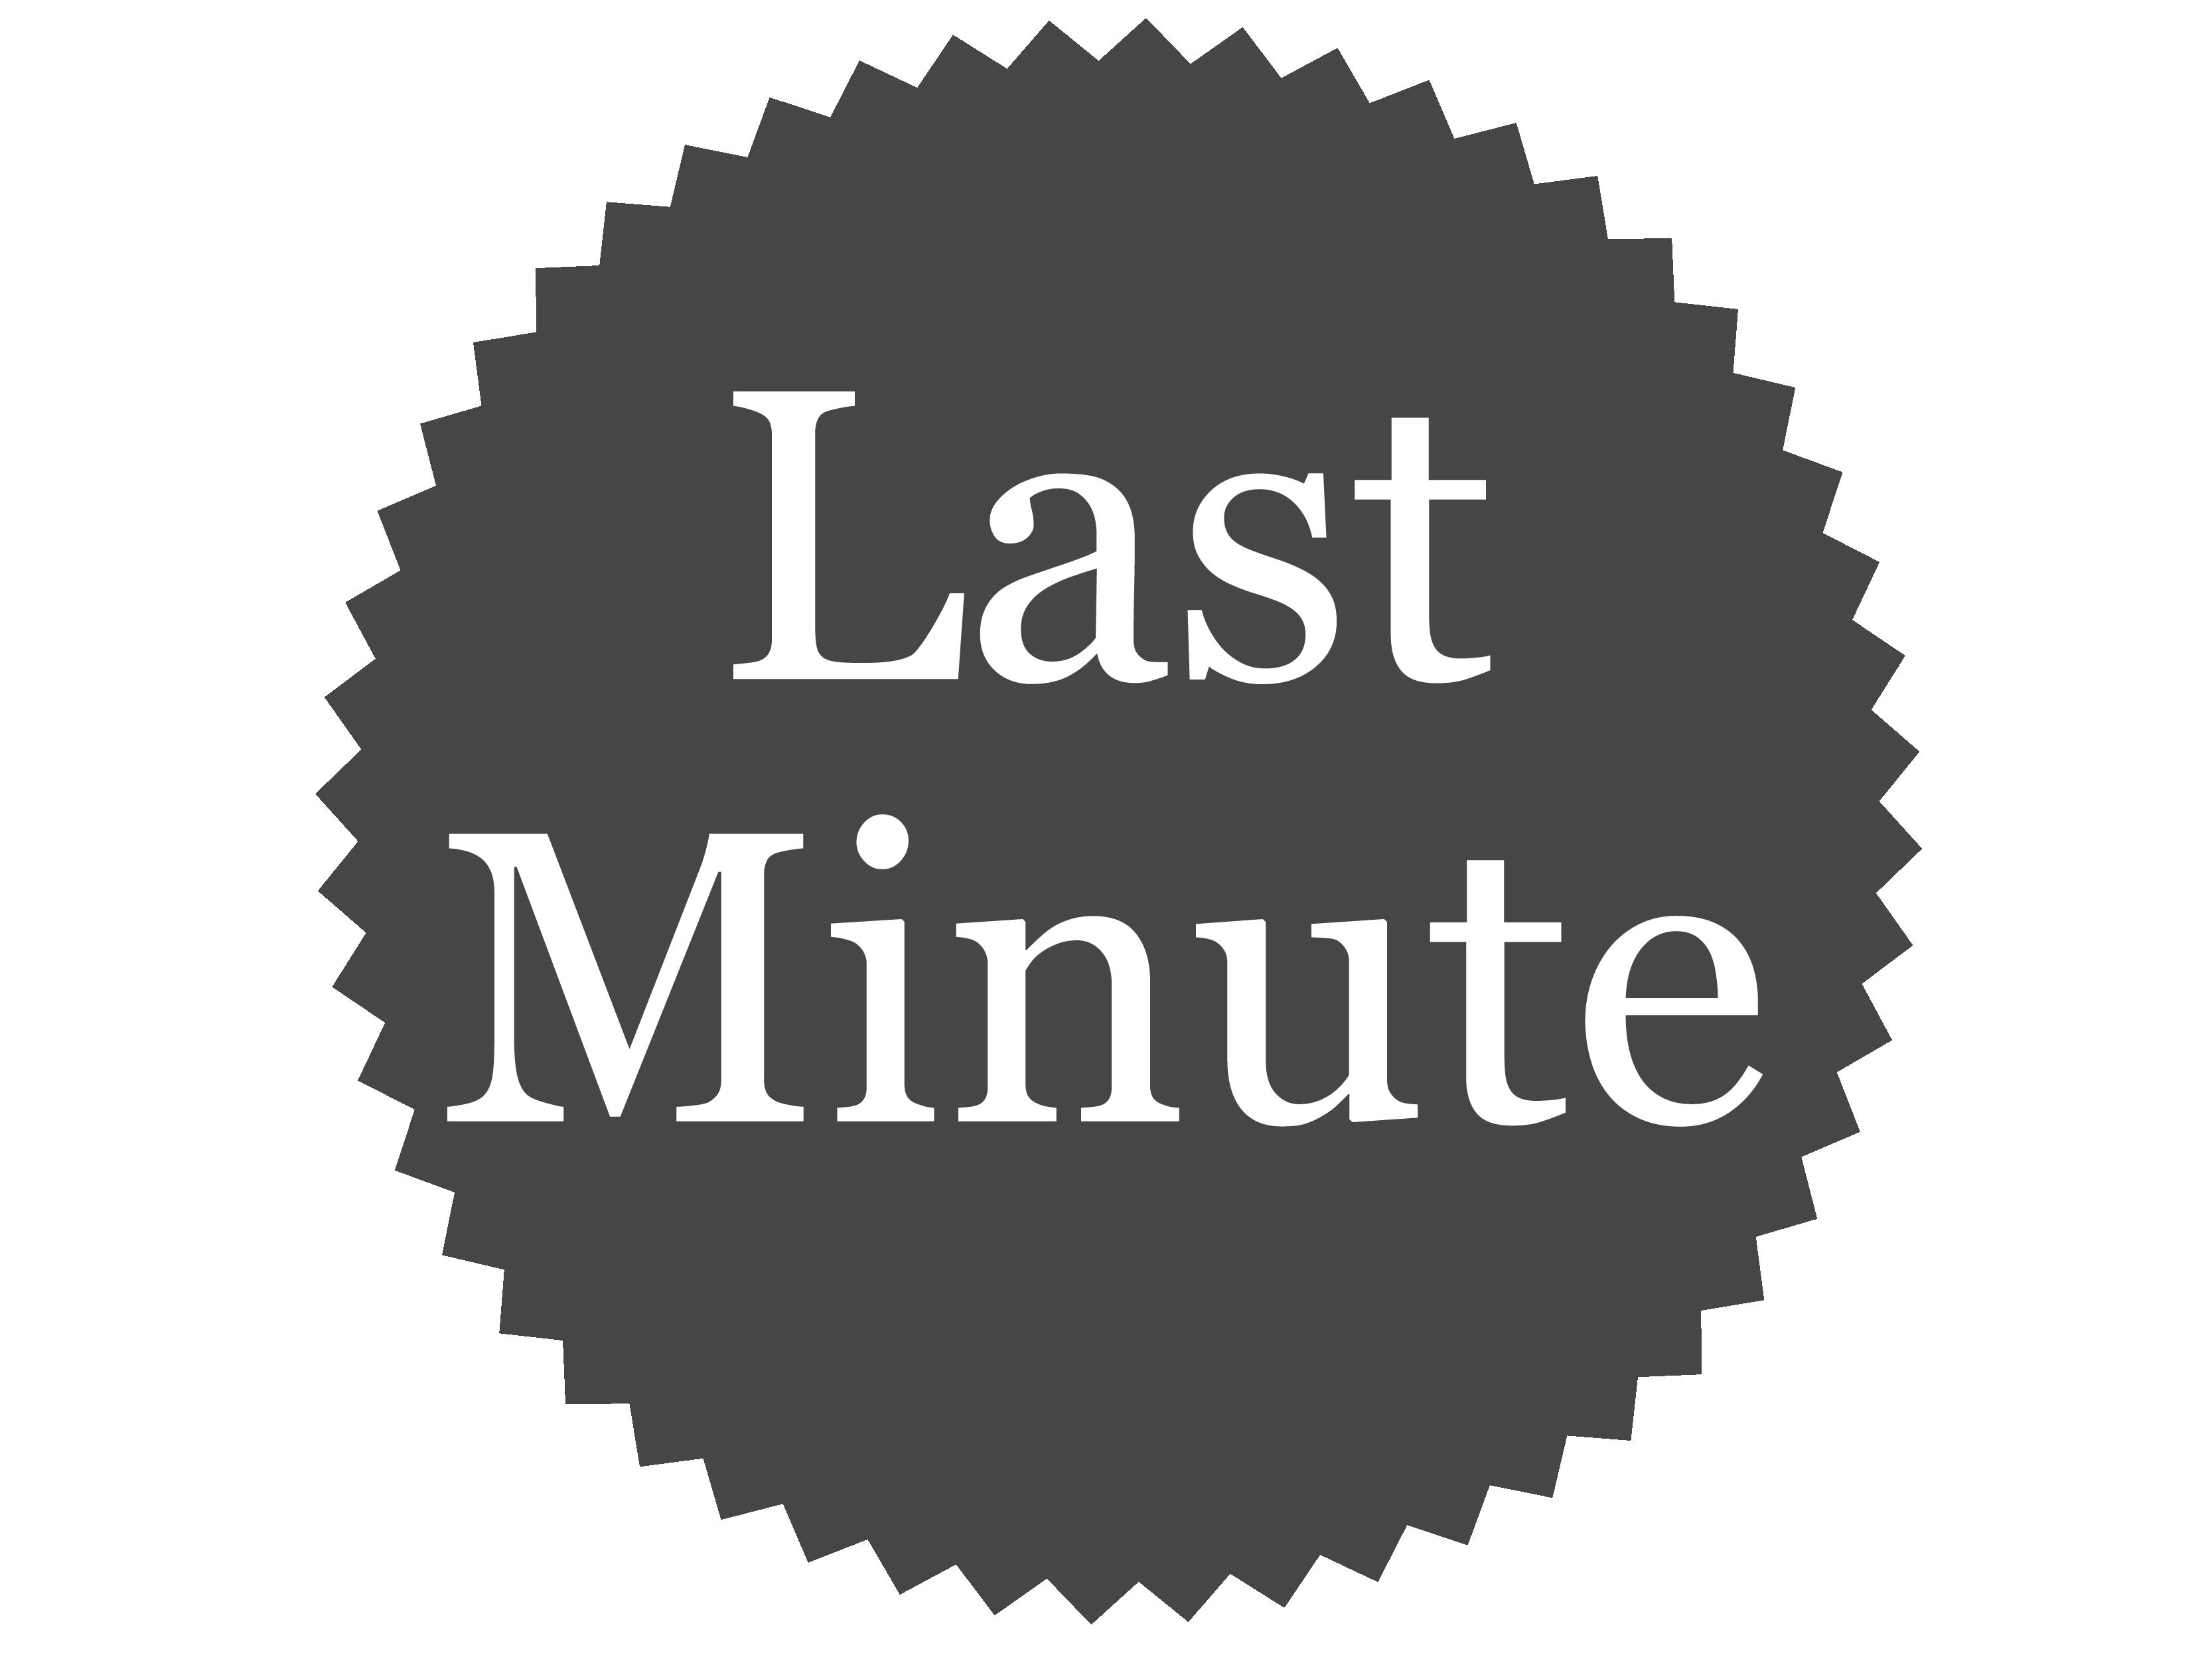 Kalendarzowy updejt – last minute